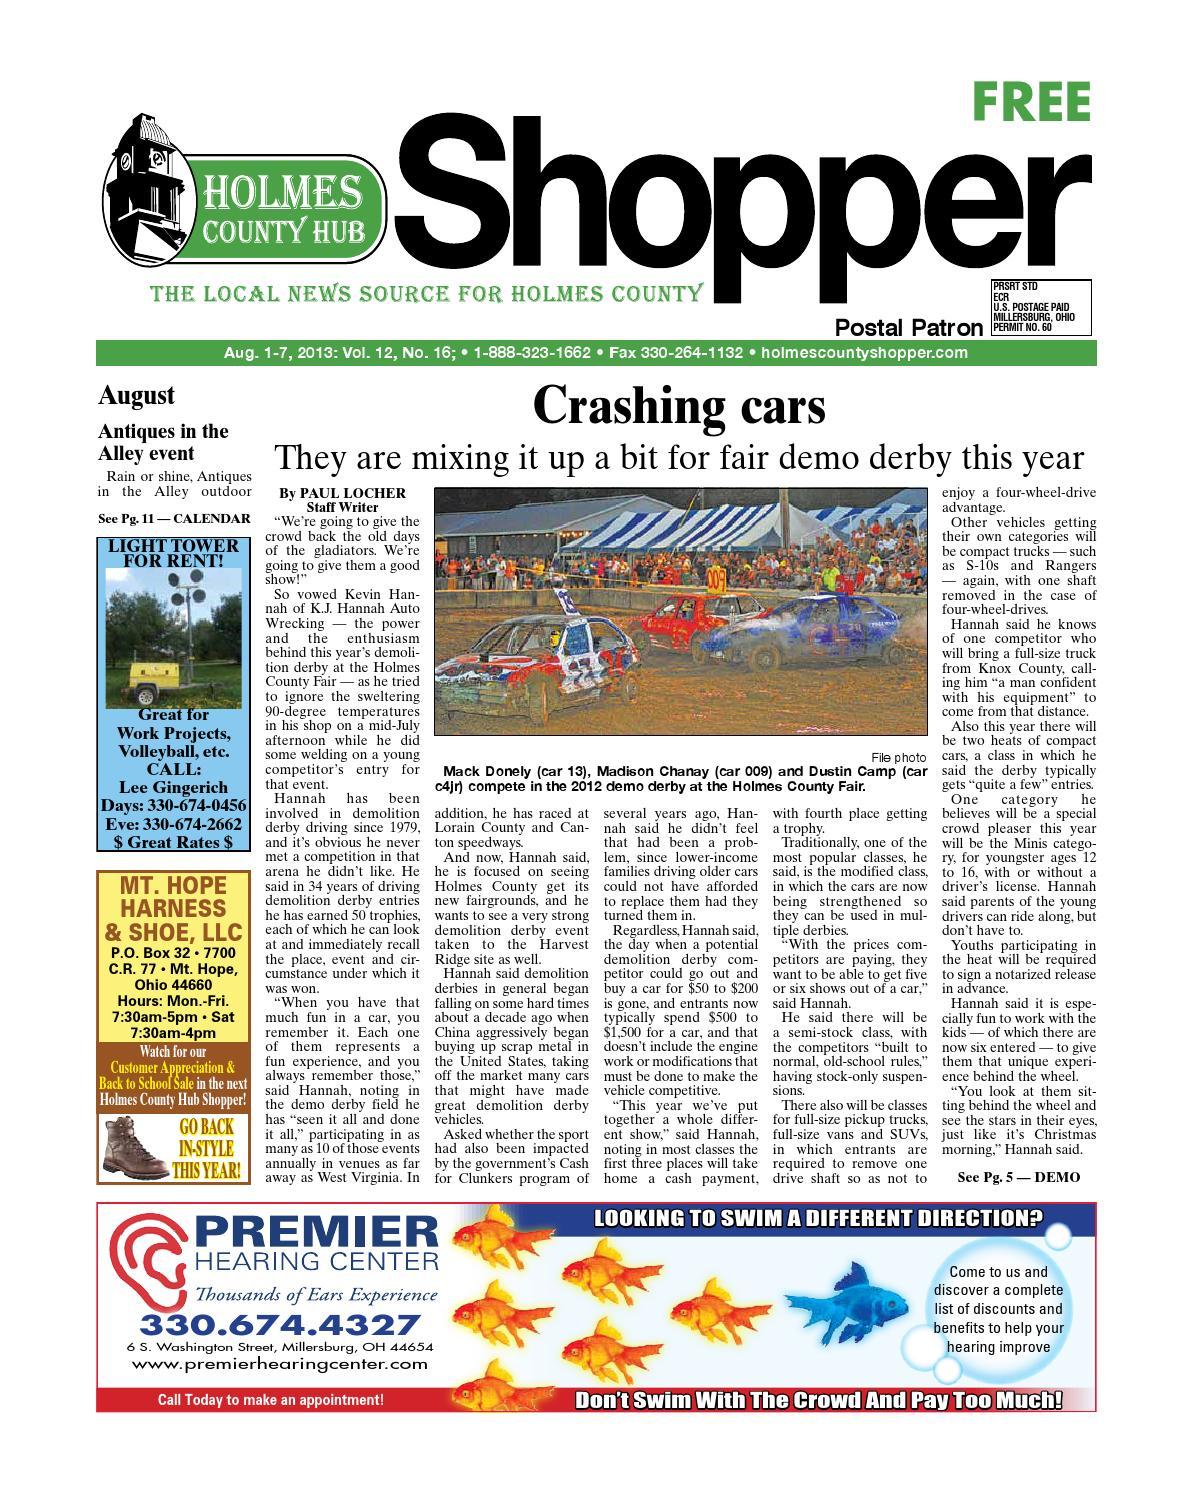 Holmes county hub shopper aug 1 2013 by gatehouse media neo issuu fandeluxe Gallery